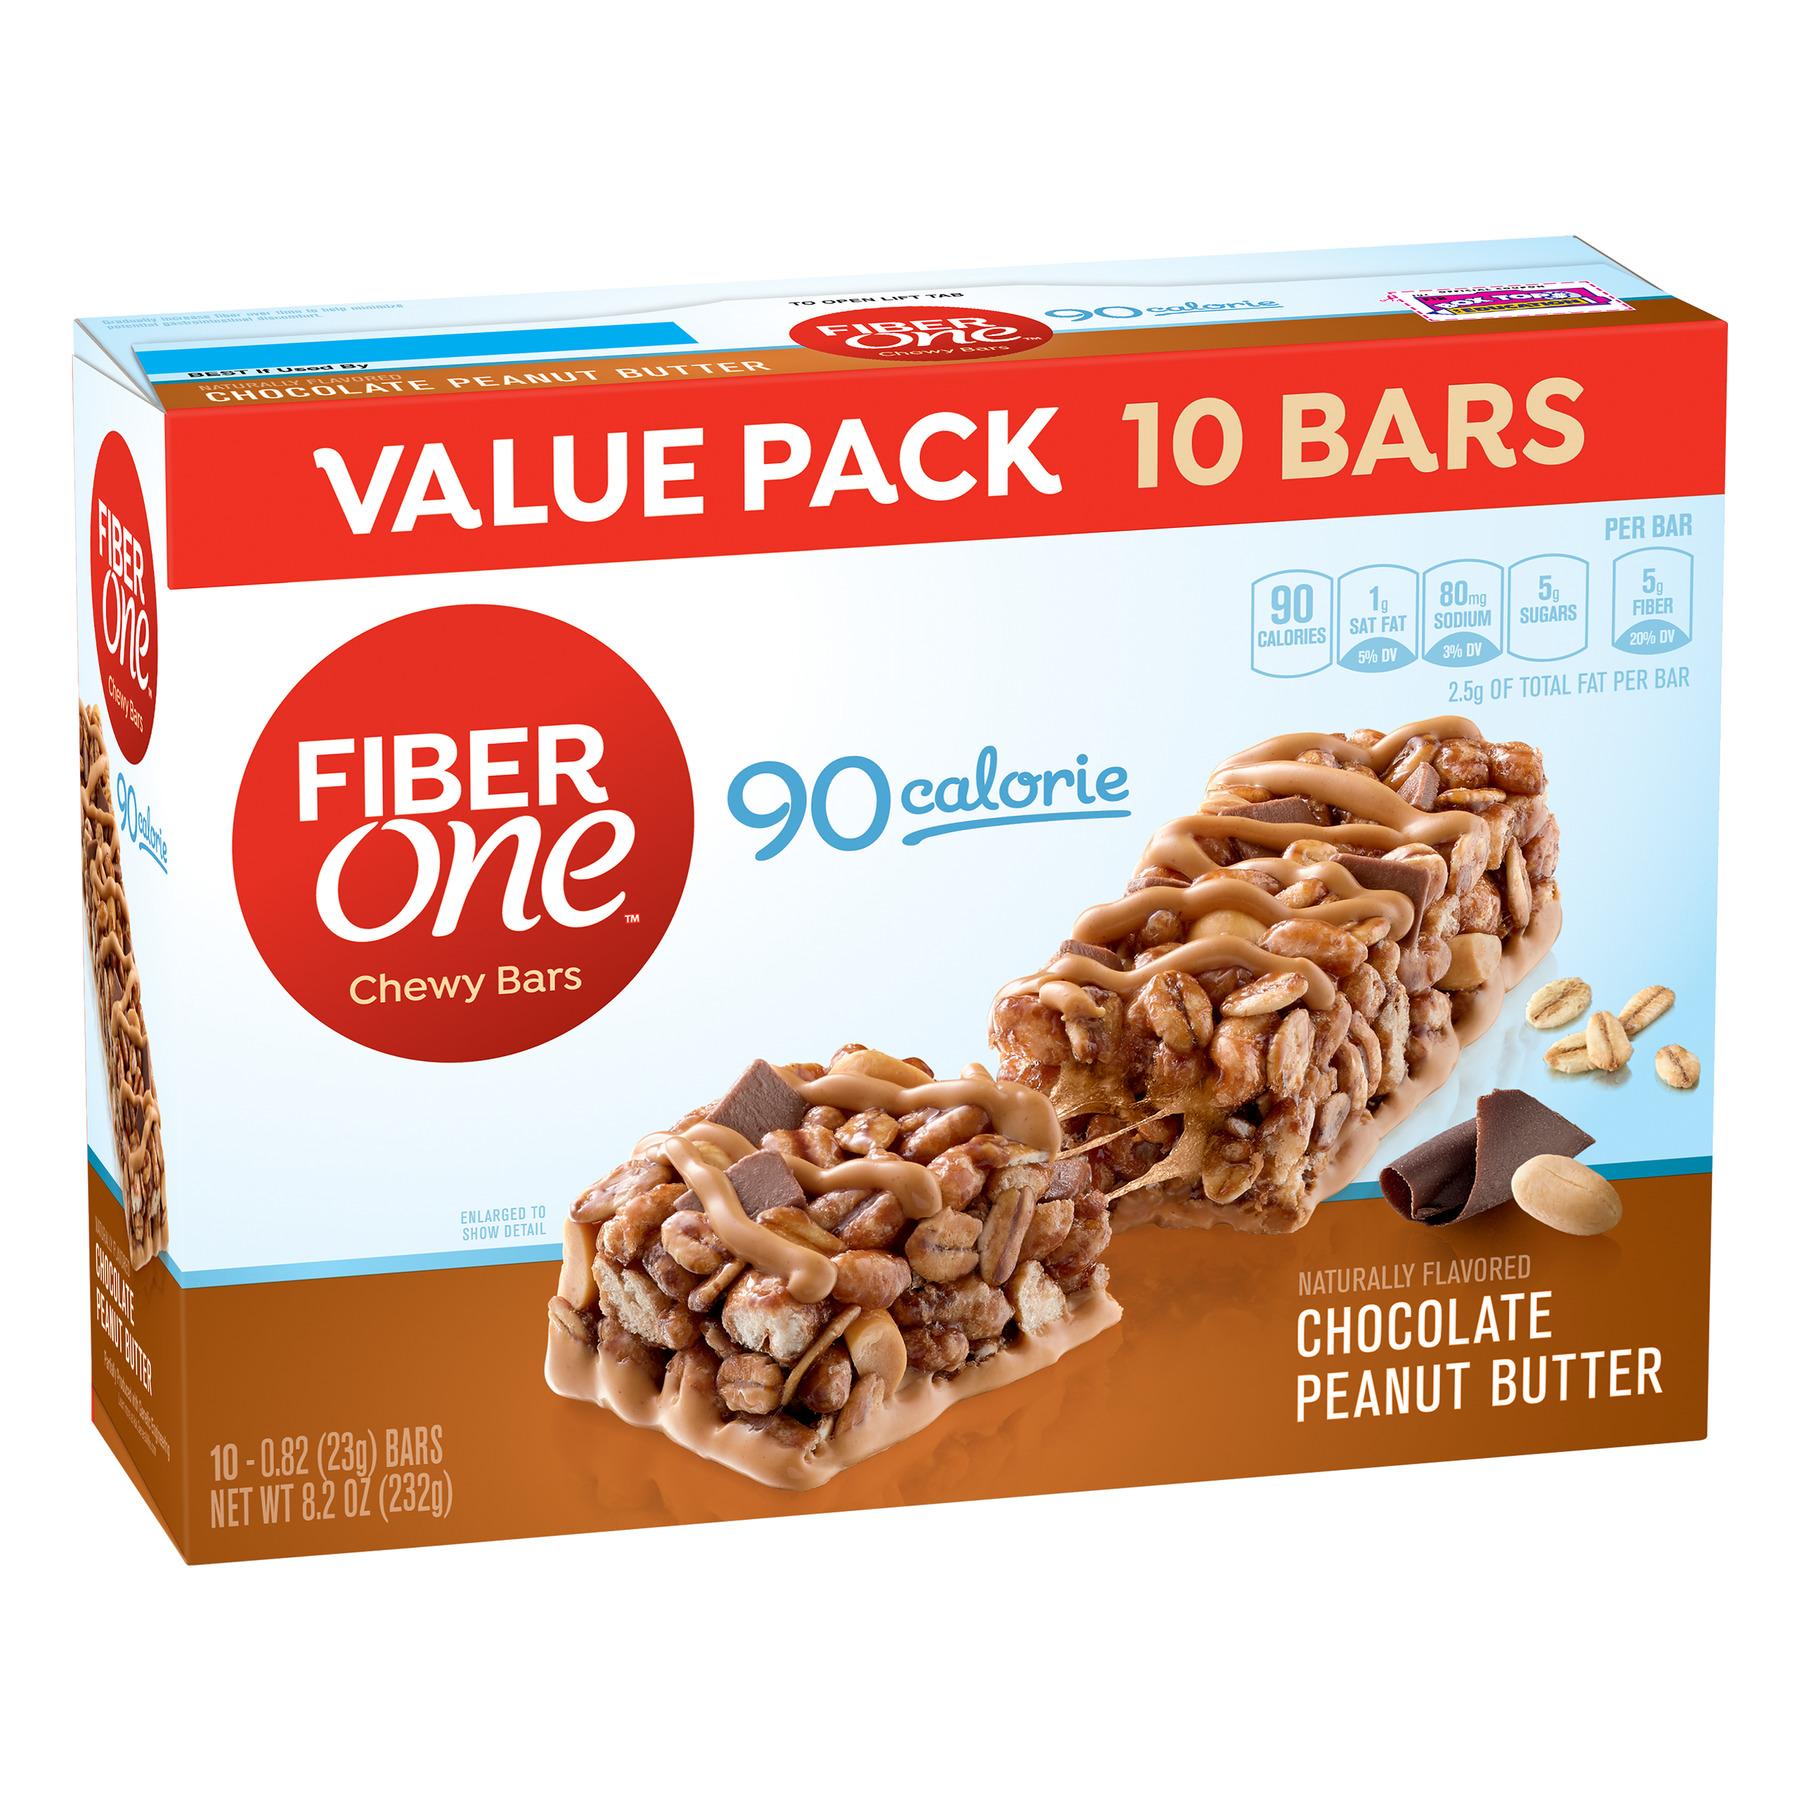 Fiber One Chewy Bar 90 Calorie Chocolate Peanut Butter 10 Fiber Bars